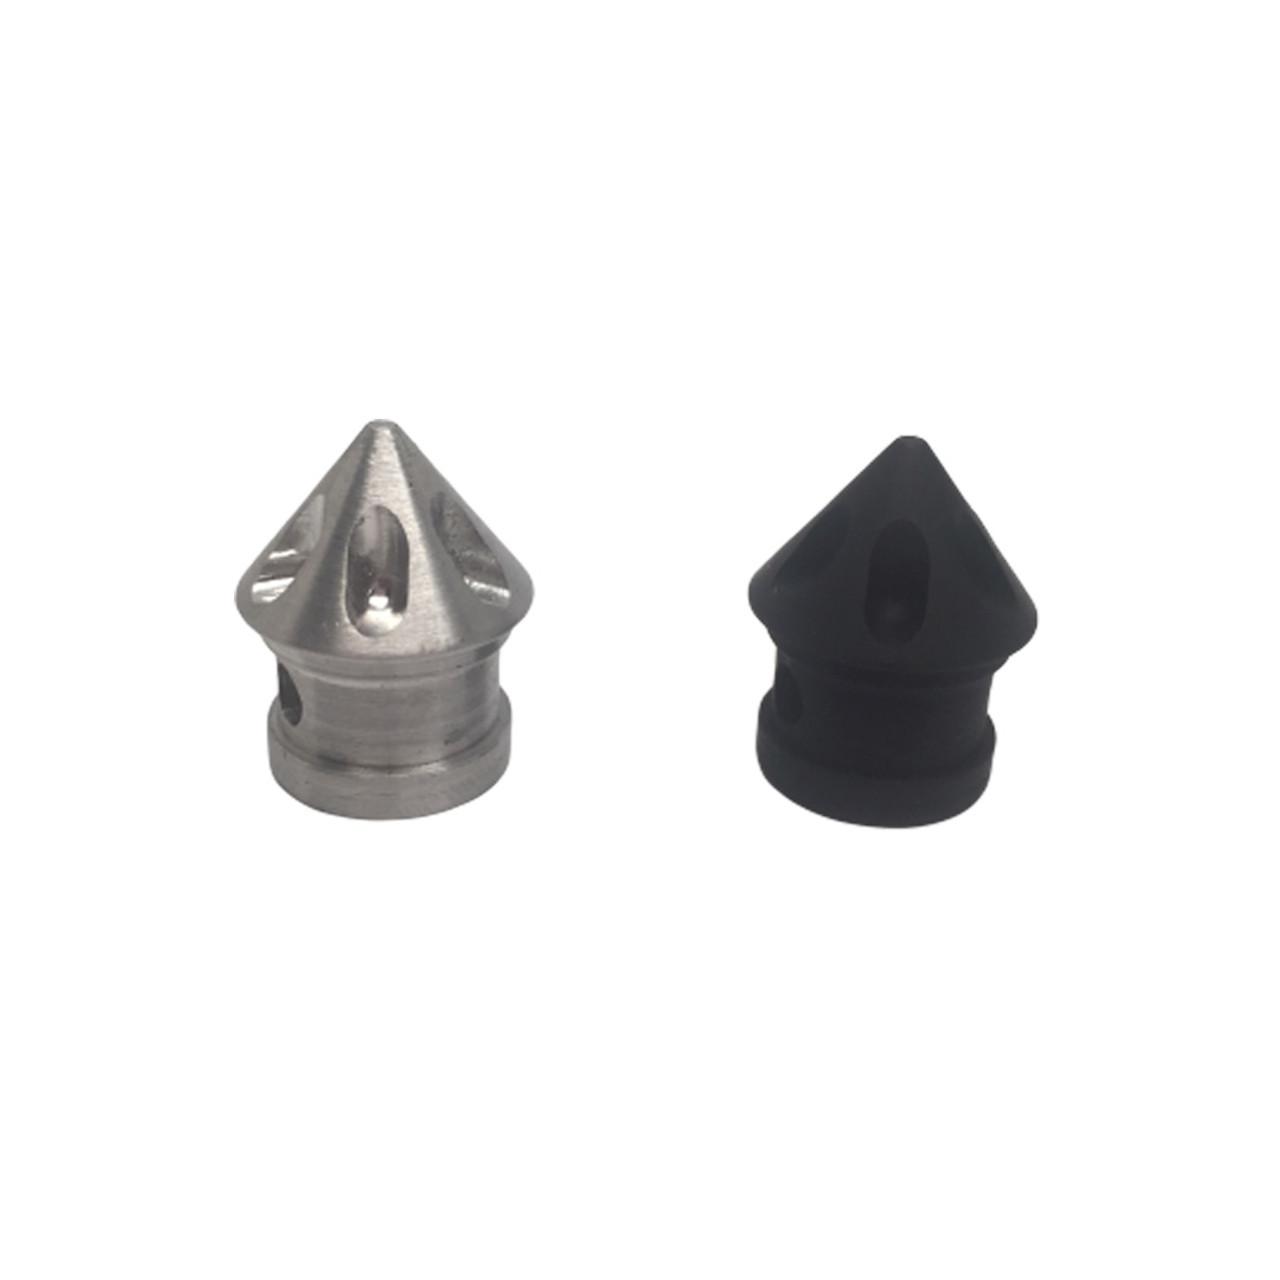 Marlin magazine caps rocket pod design 336 30-30 35 Rem 1894 44 mag 45 colt 357 Mag